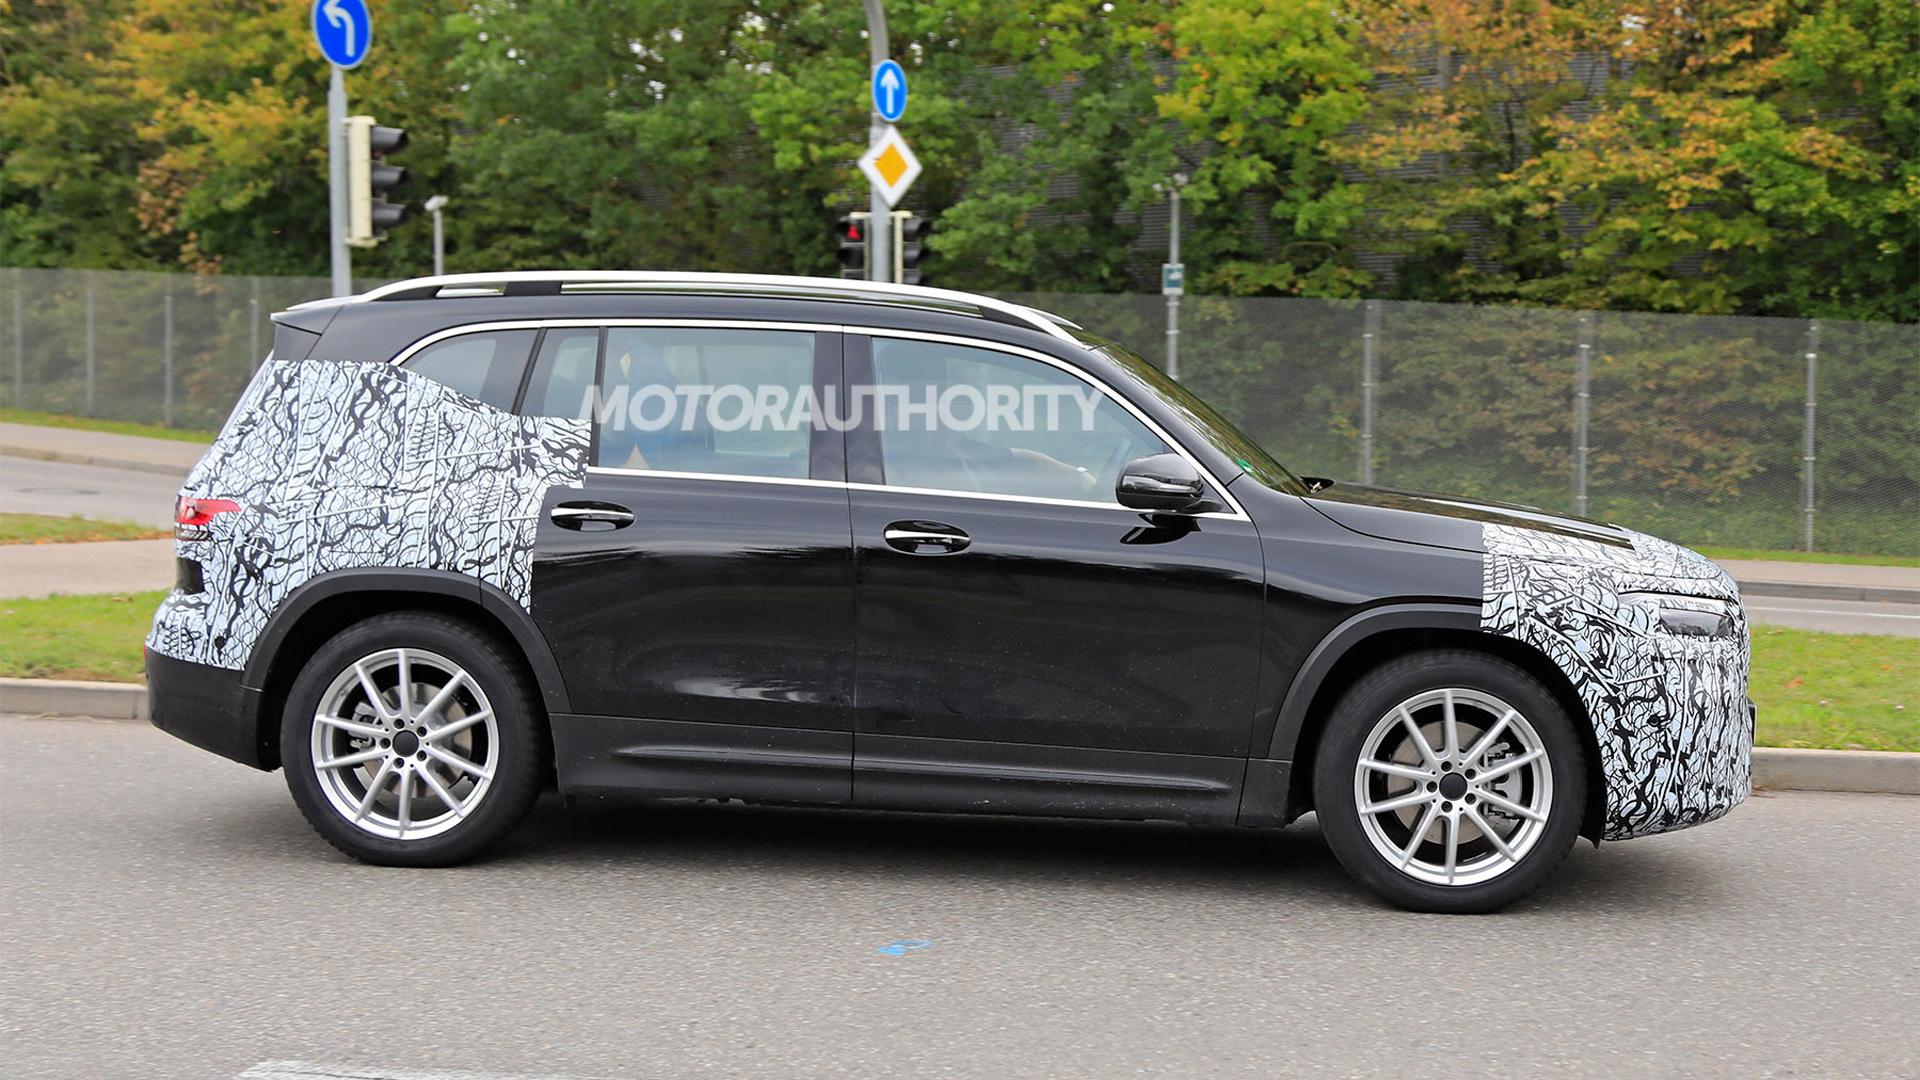 2021 Mercedes-Benz EQB spy shots - Photo credit: S. Baldauf/SB-Medien